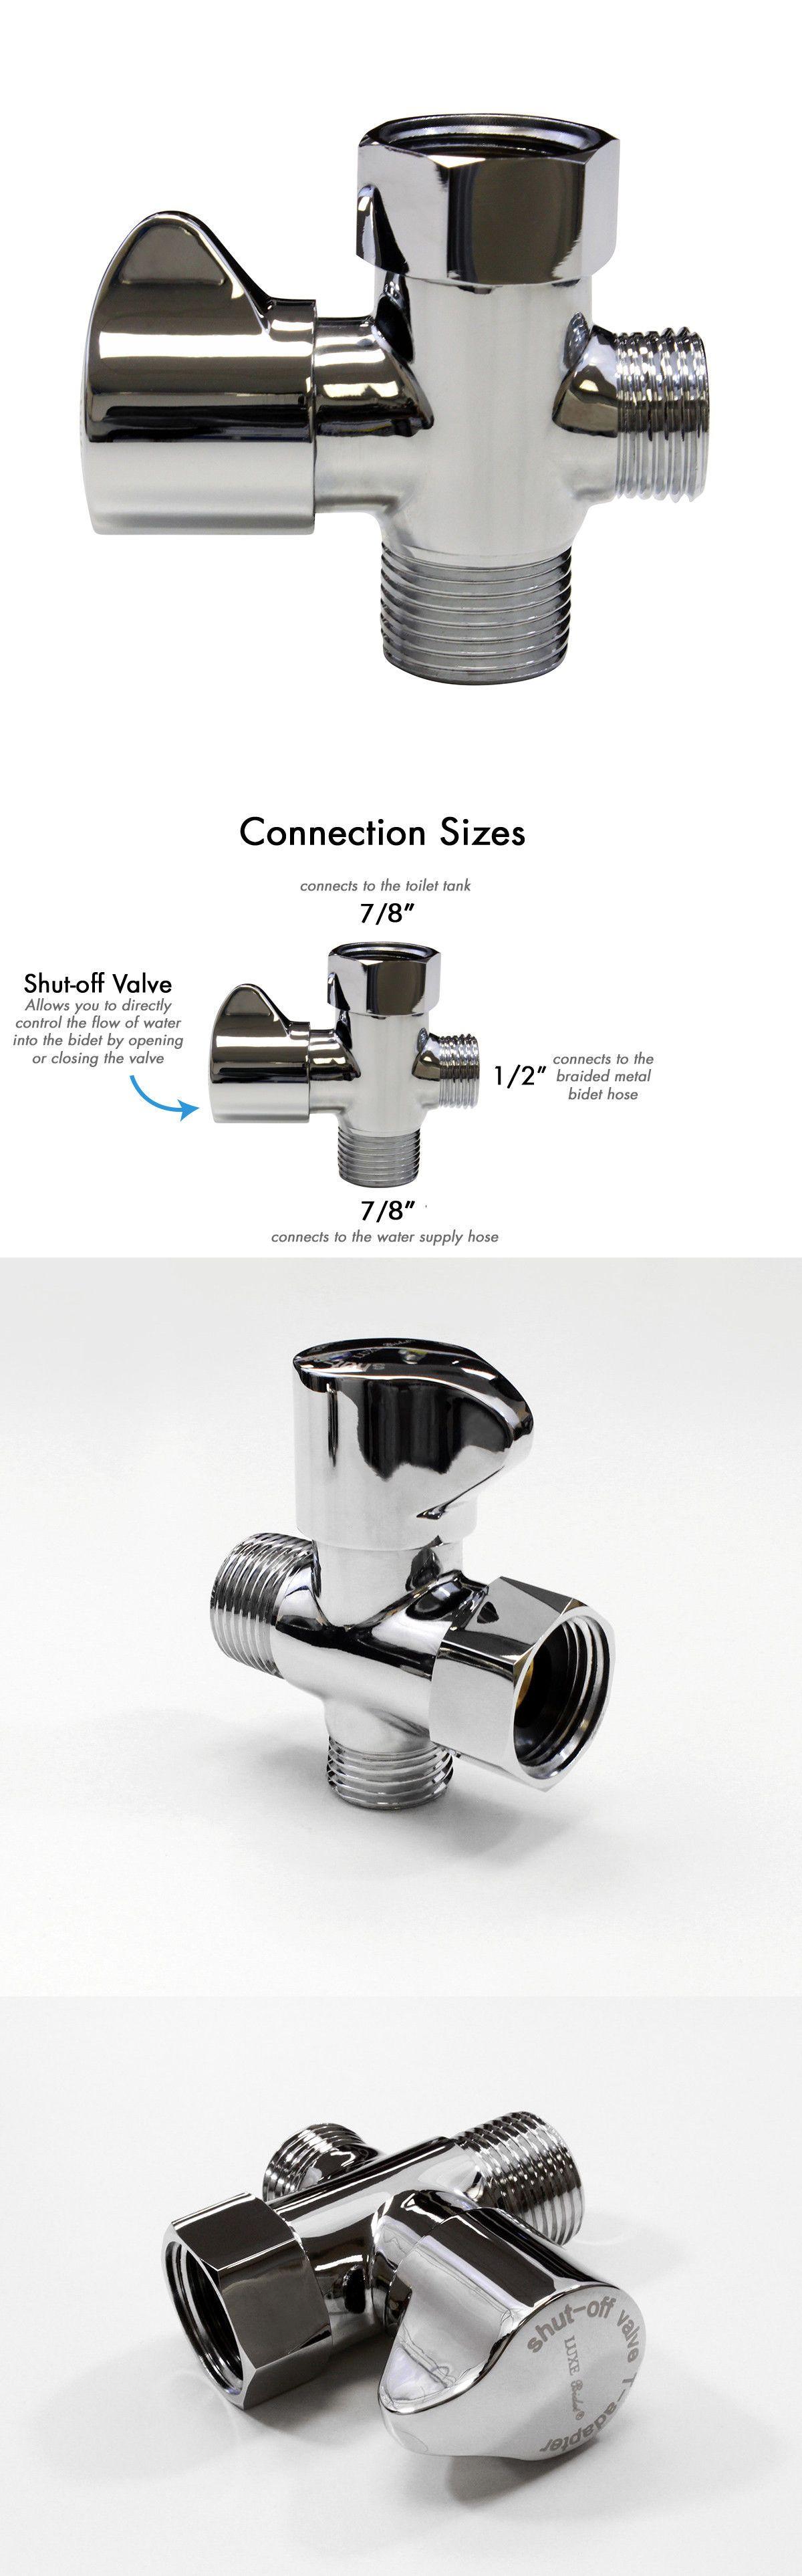 Brass Toilet Bidet Valve 7 8 1 2 T Adapter Shut Off 3 Way